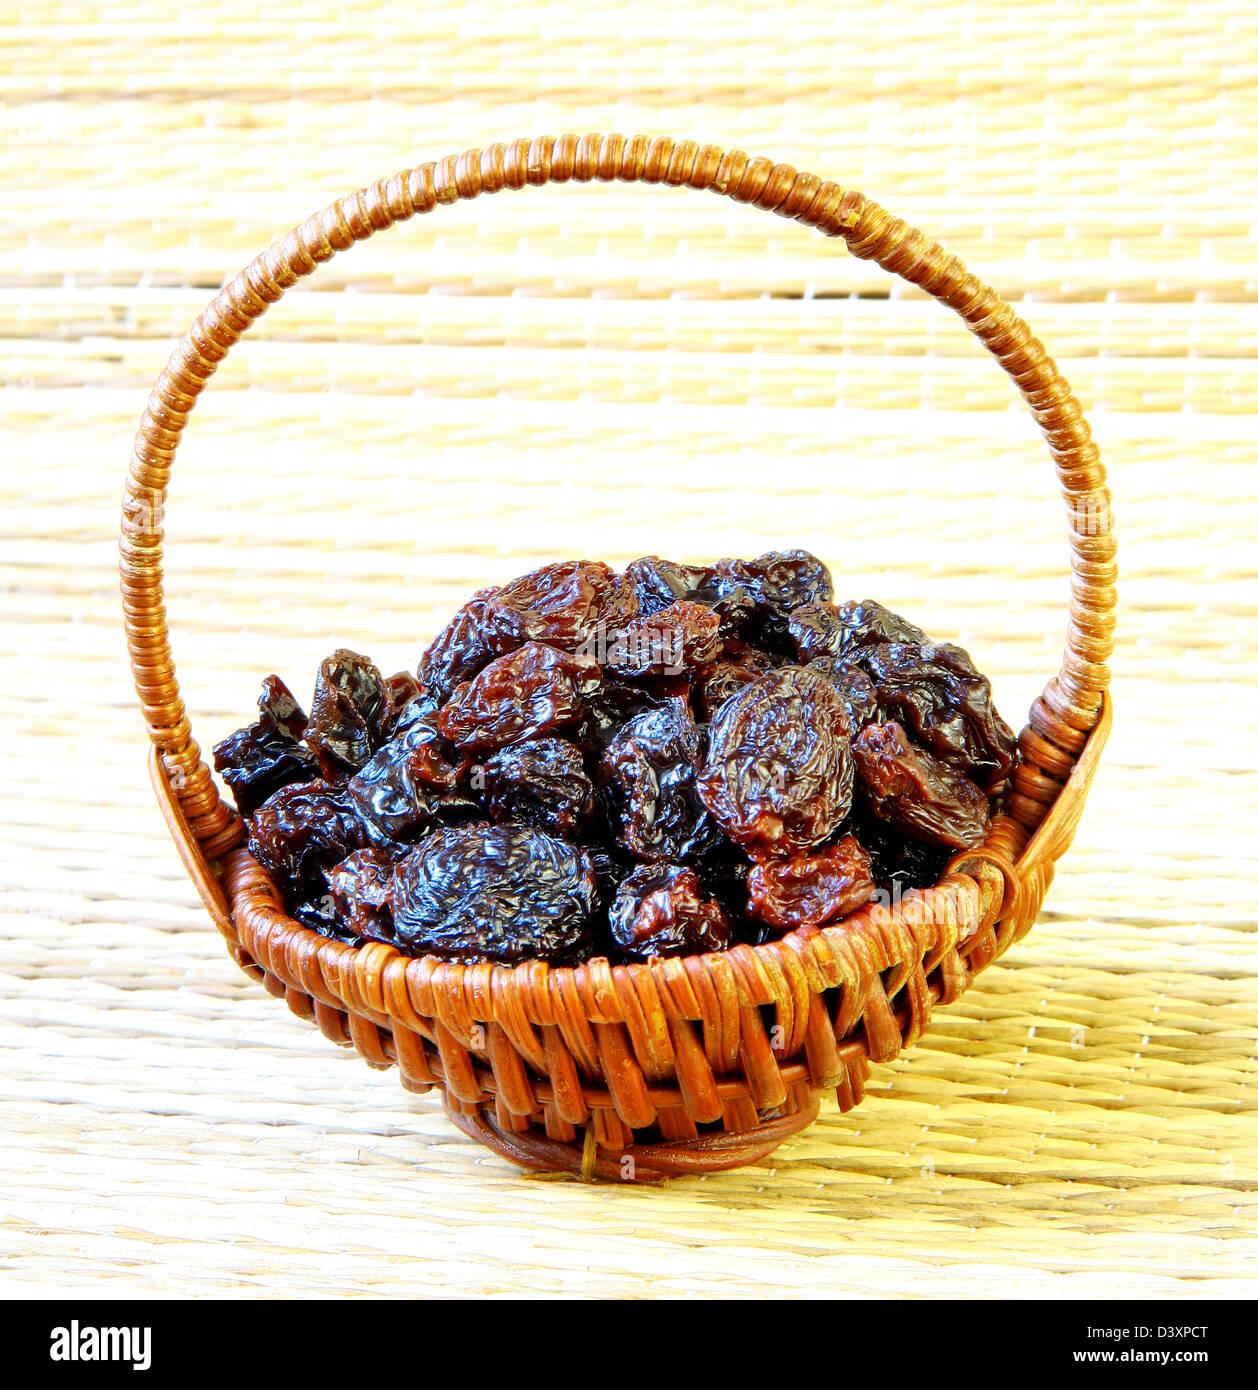 Black raisin in wicker basket on matting sunlight background - Stock Image